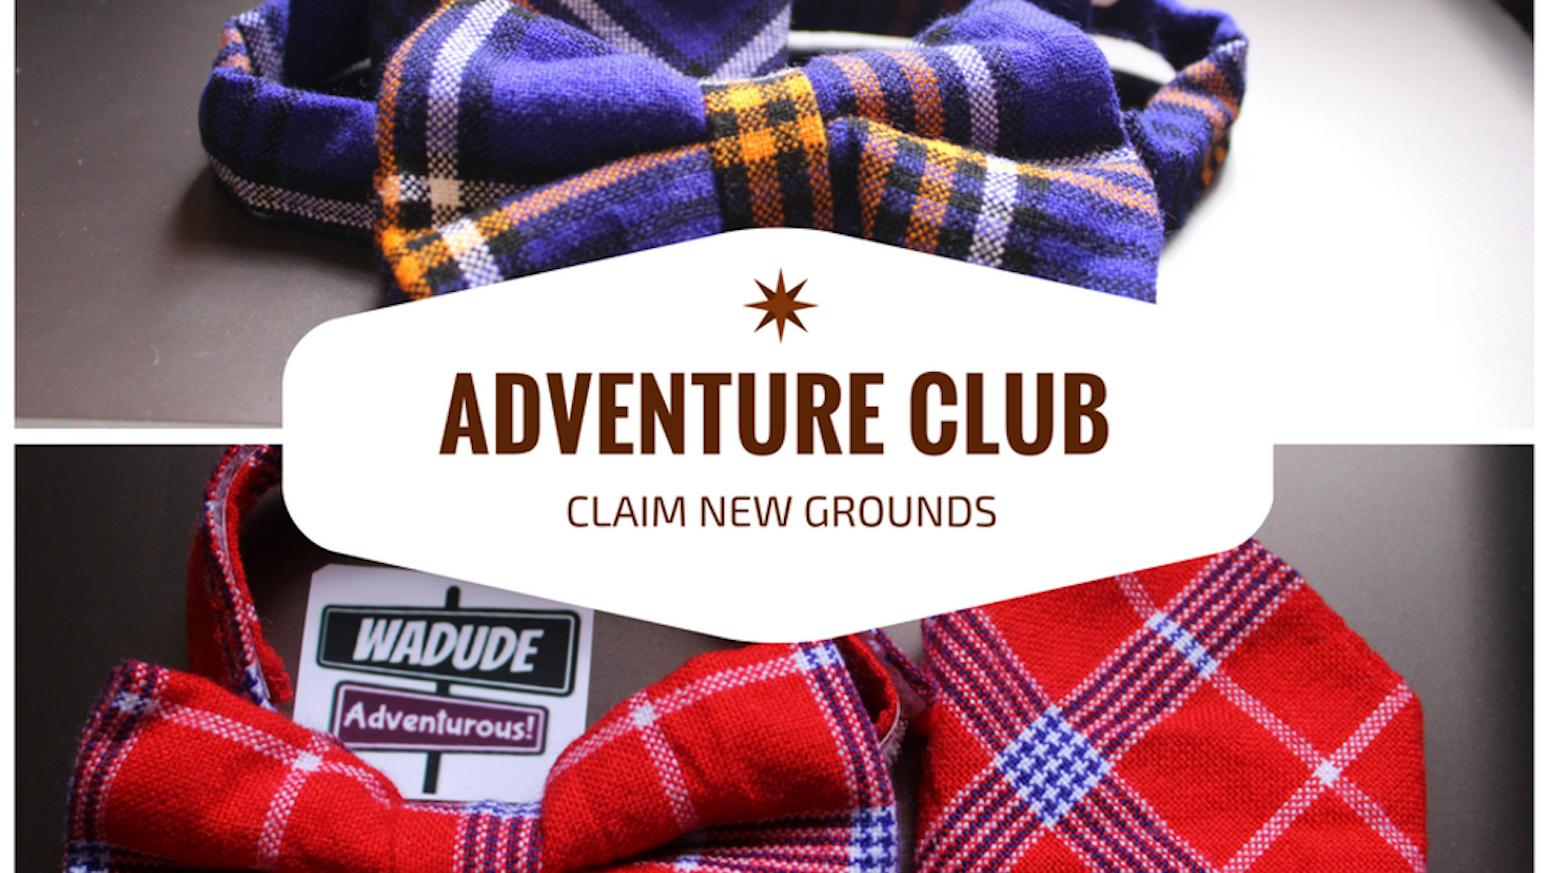 499c1ad81 Wadude-Adventure inspired Bow Ties. by Cath Gitts — Kickstarter